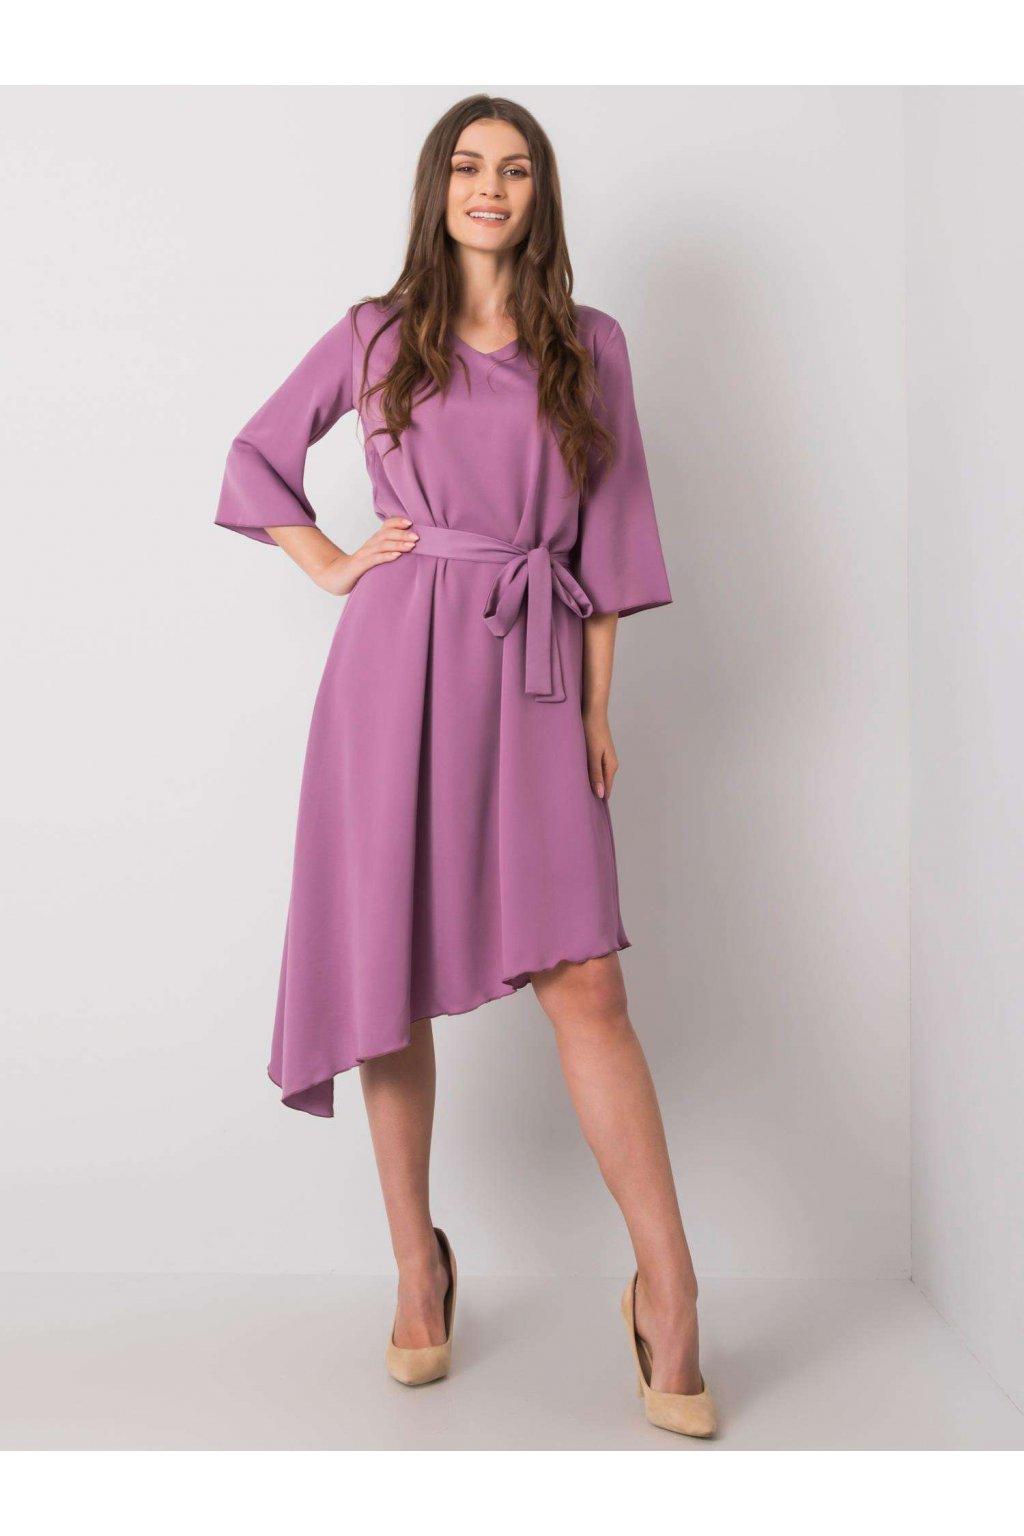 pol pl Fioletowa sukienka Imene 367010 2